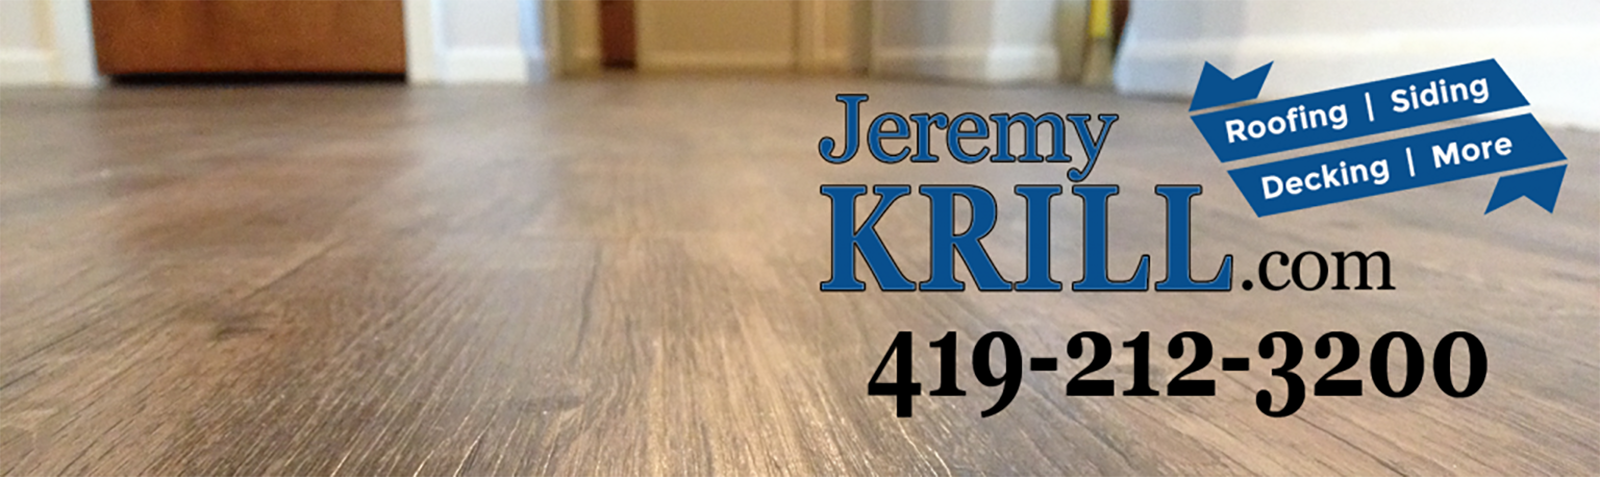 JeremyKrill.com